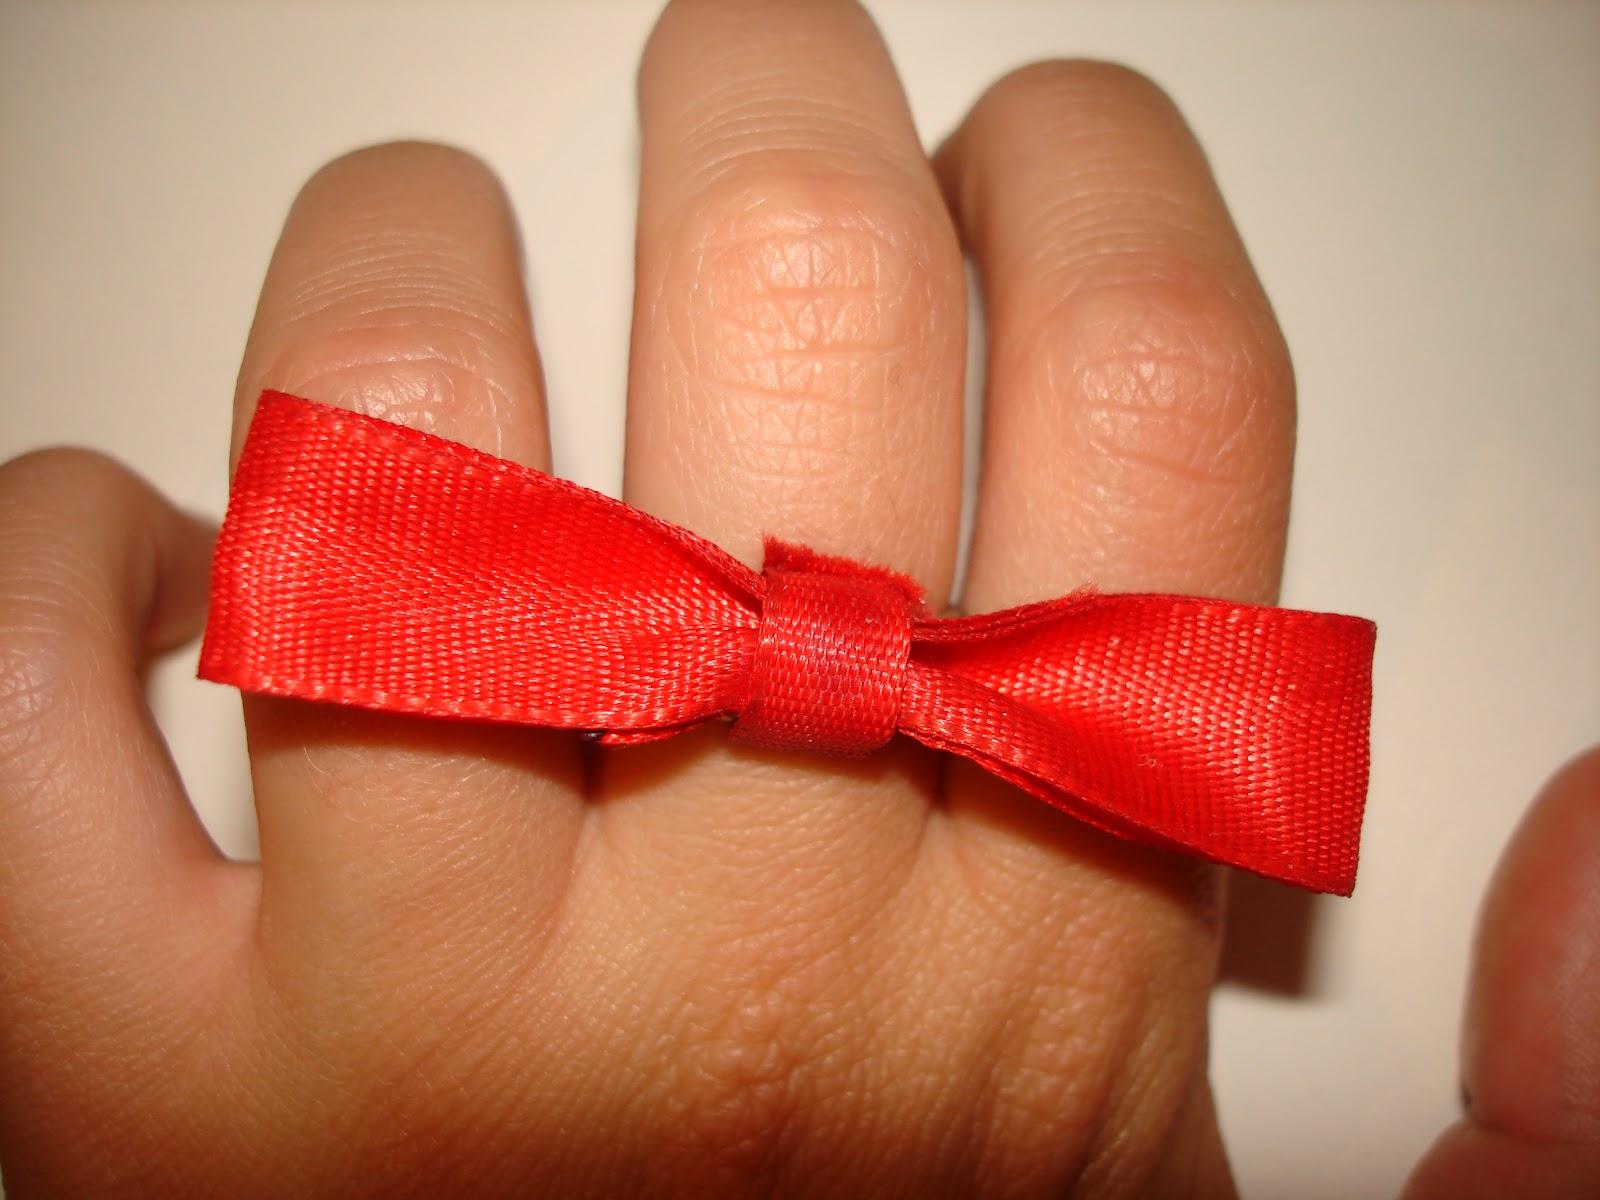 kipattant egy piros foltot a kezemen)